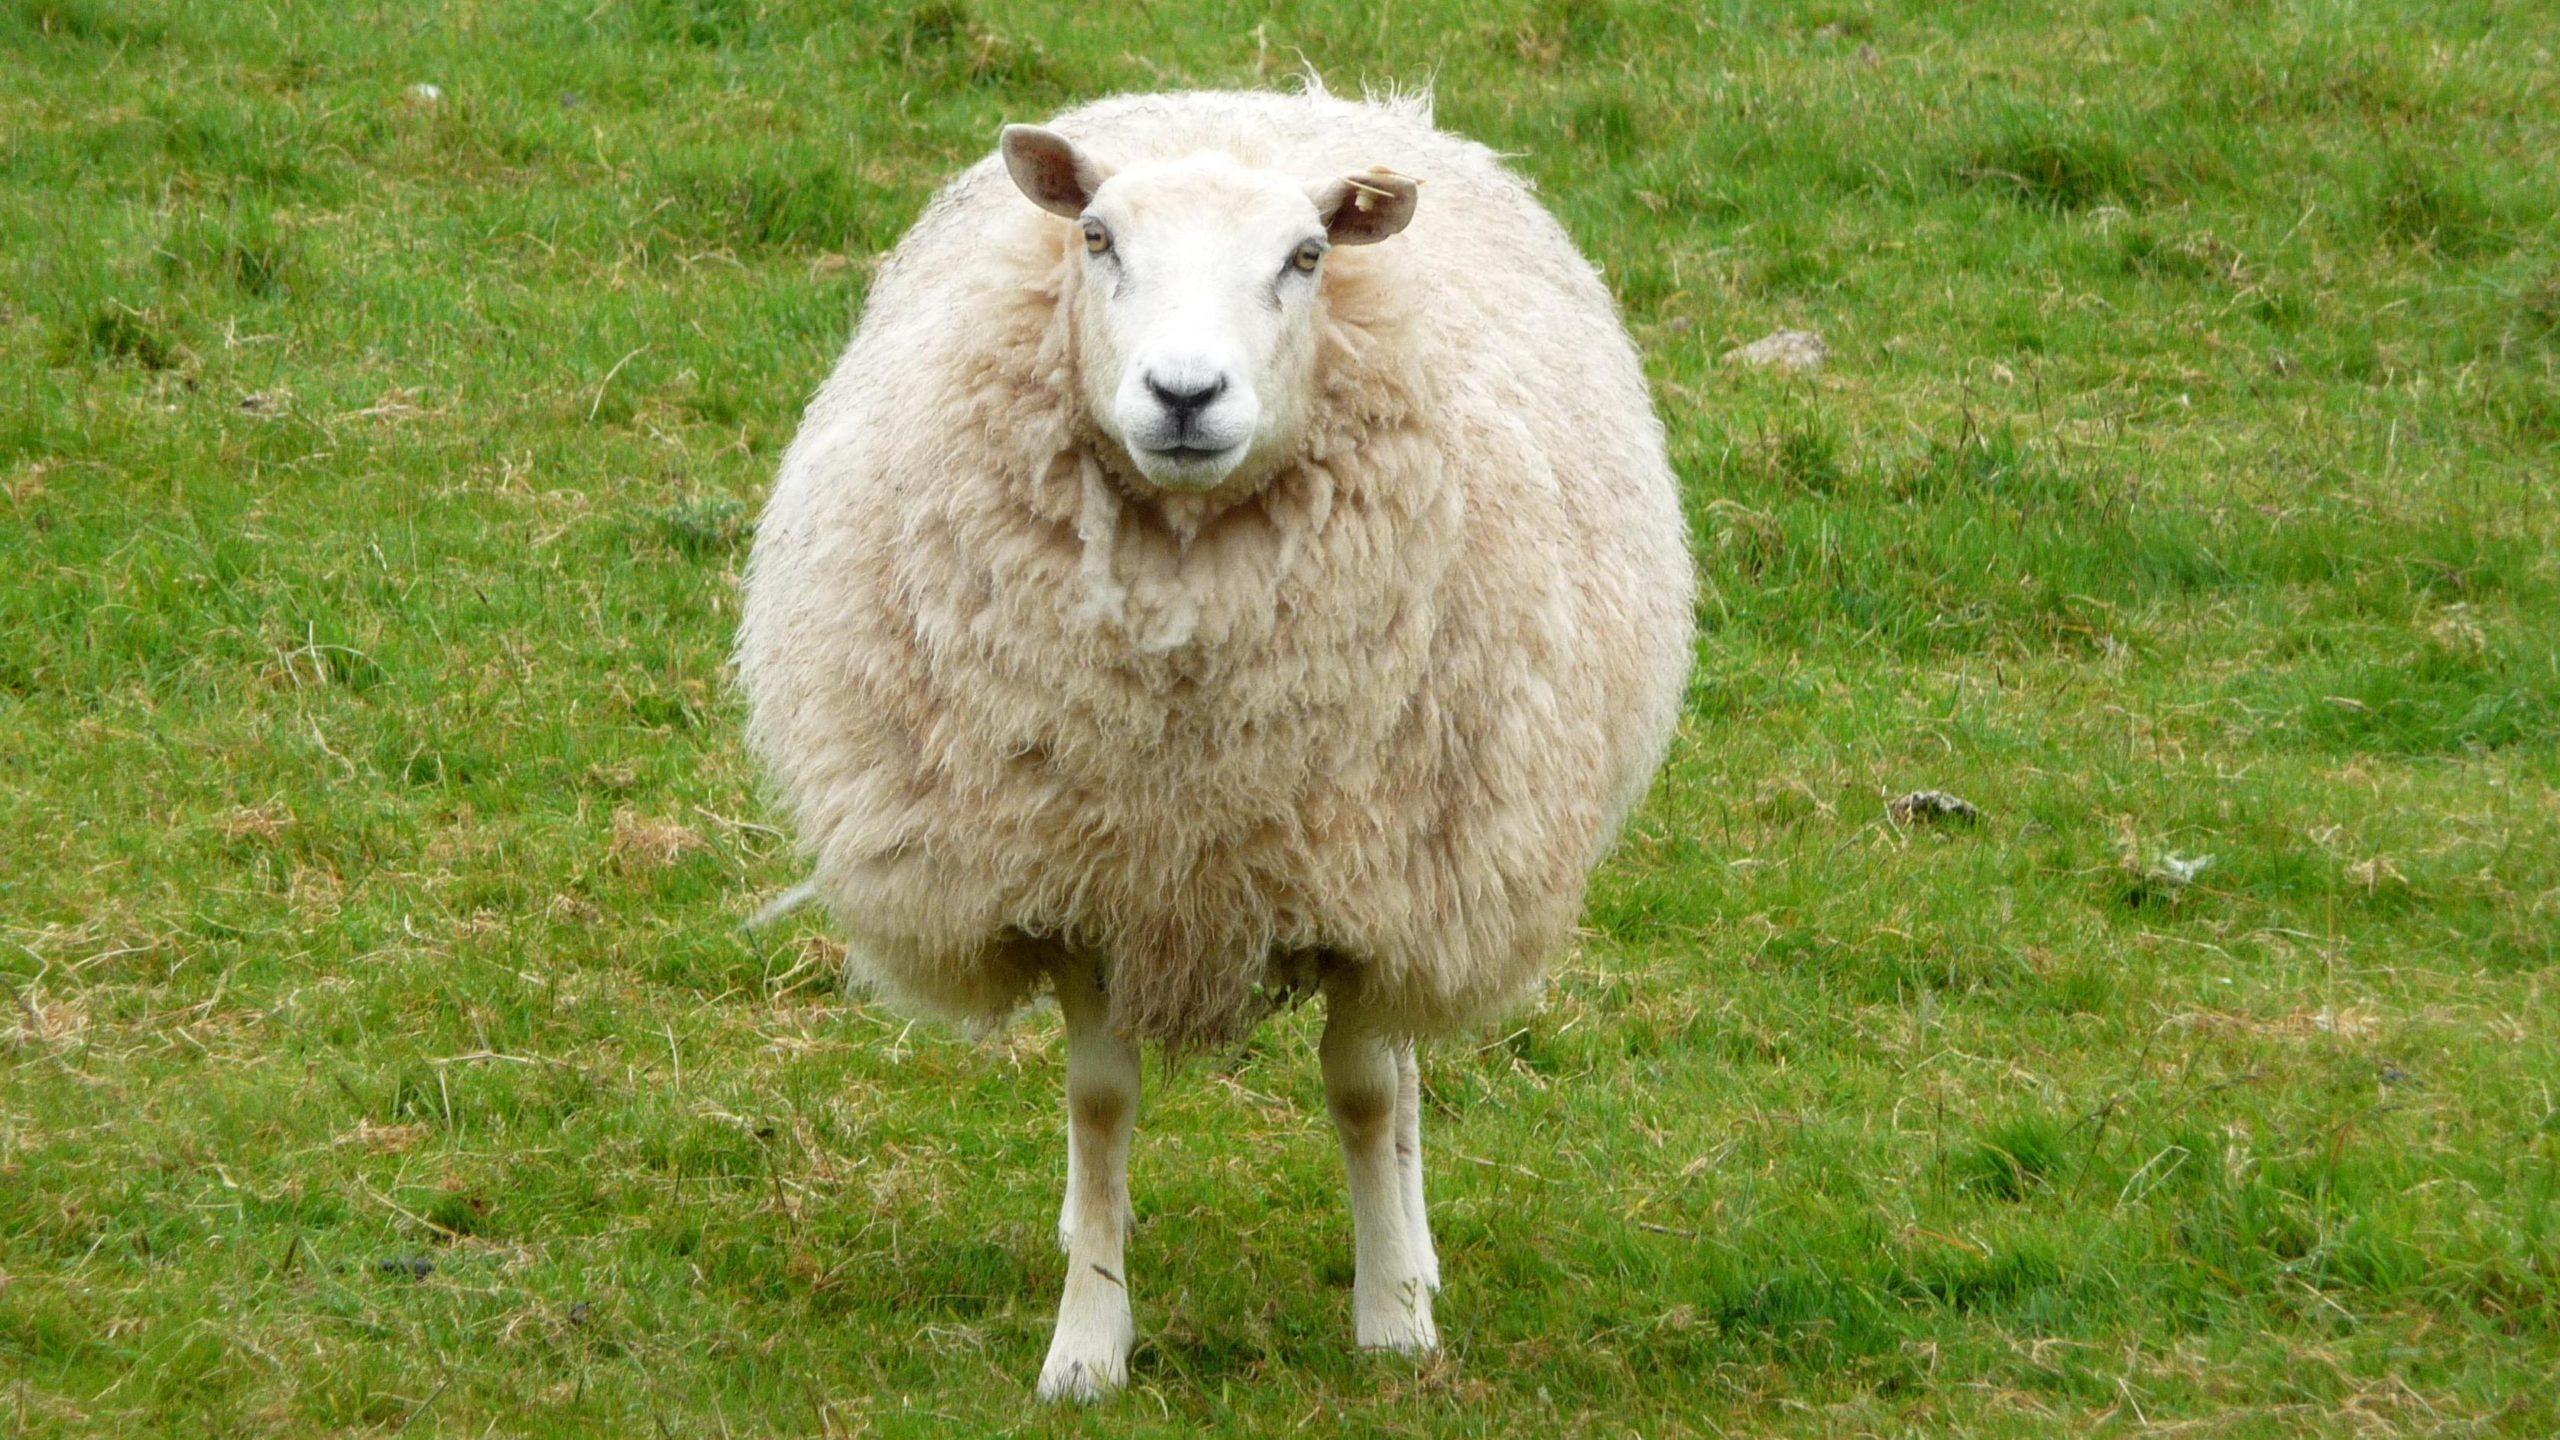 sheep-noun ʃiːp-plural sheep-